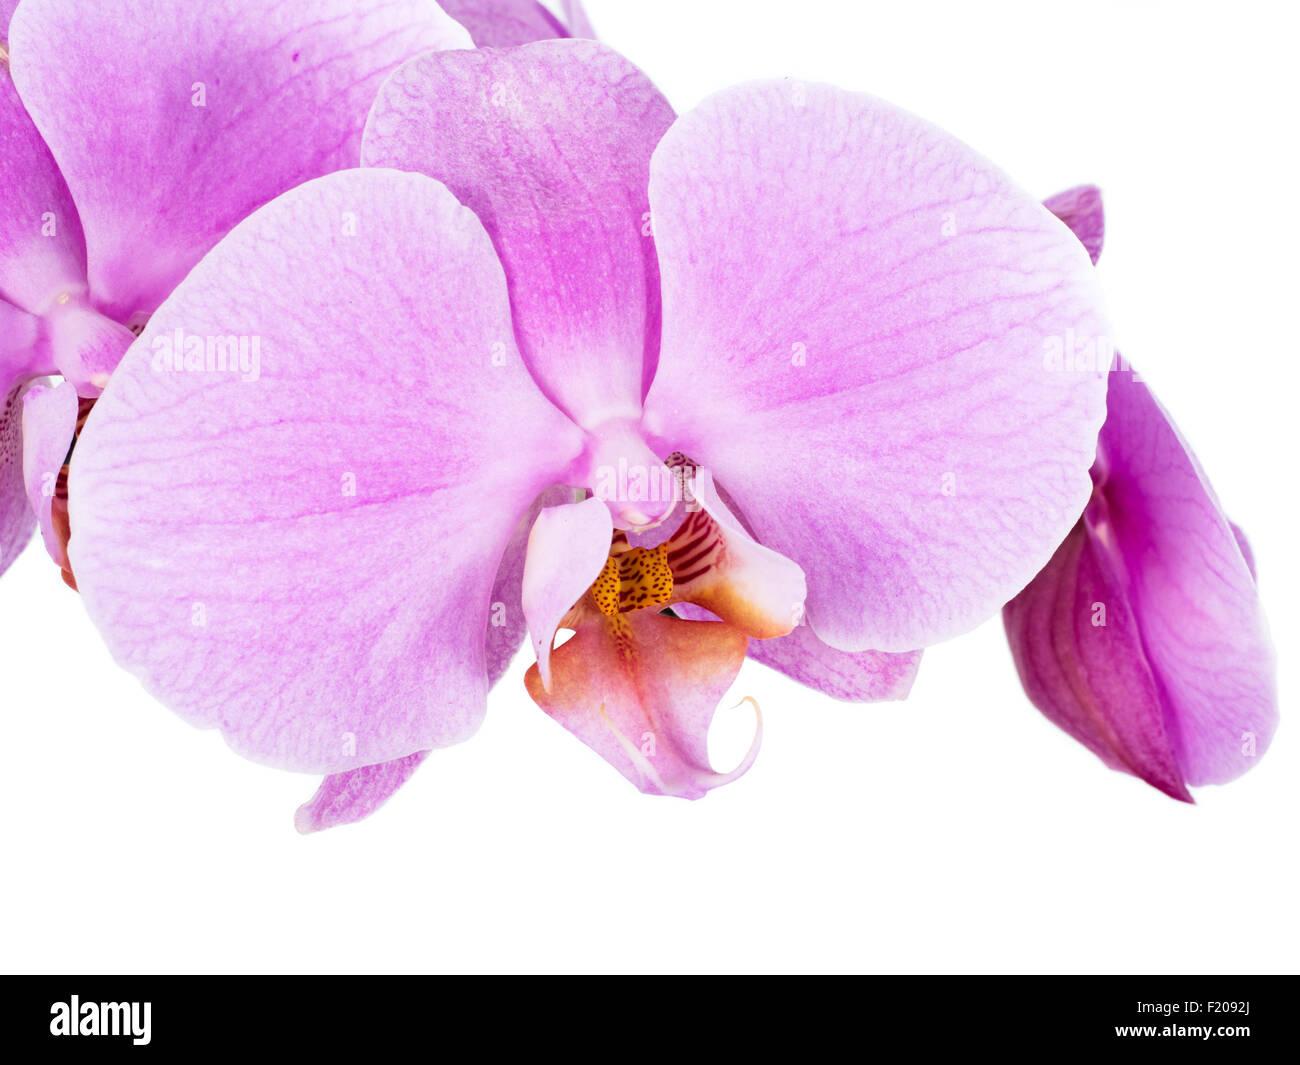 Orchidee - Stock Image